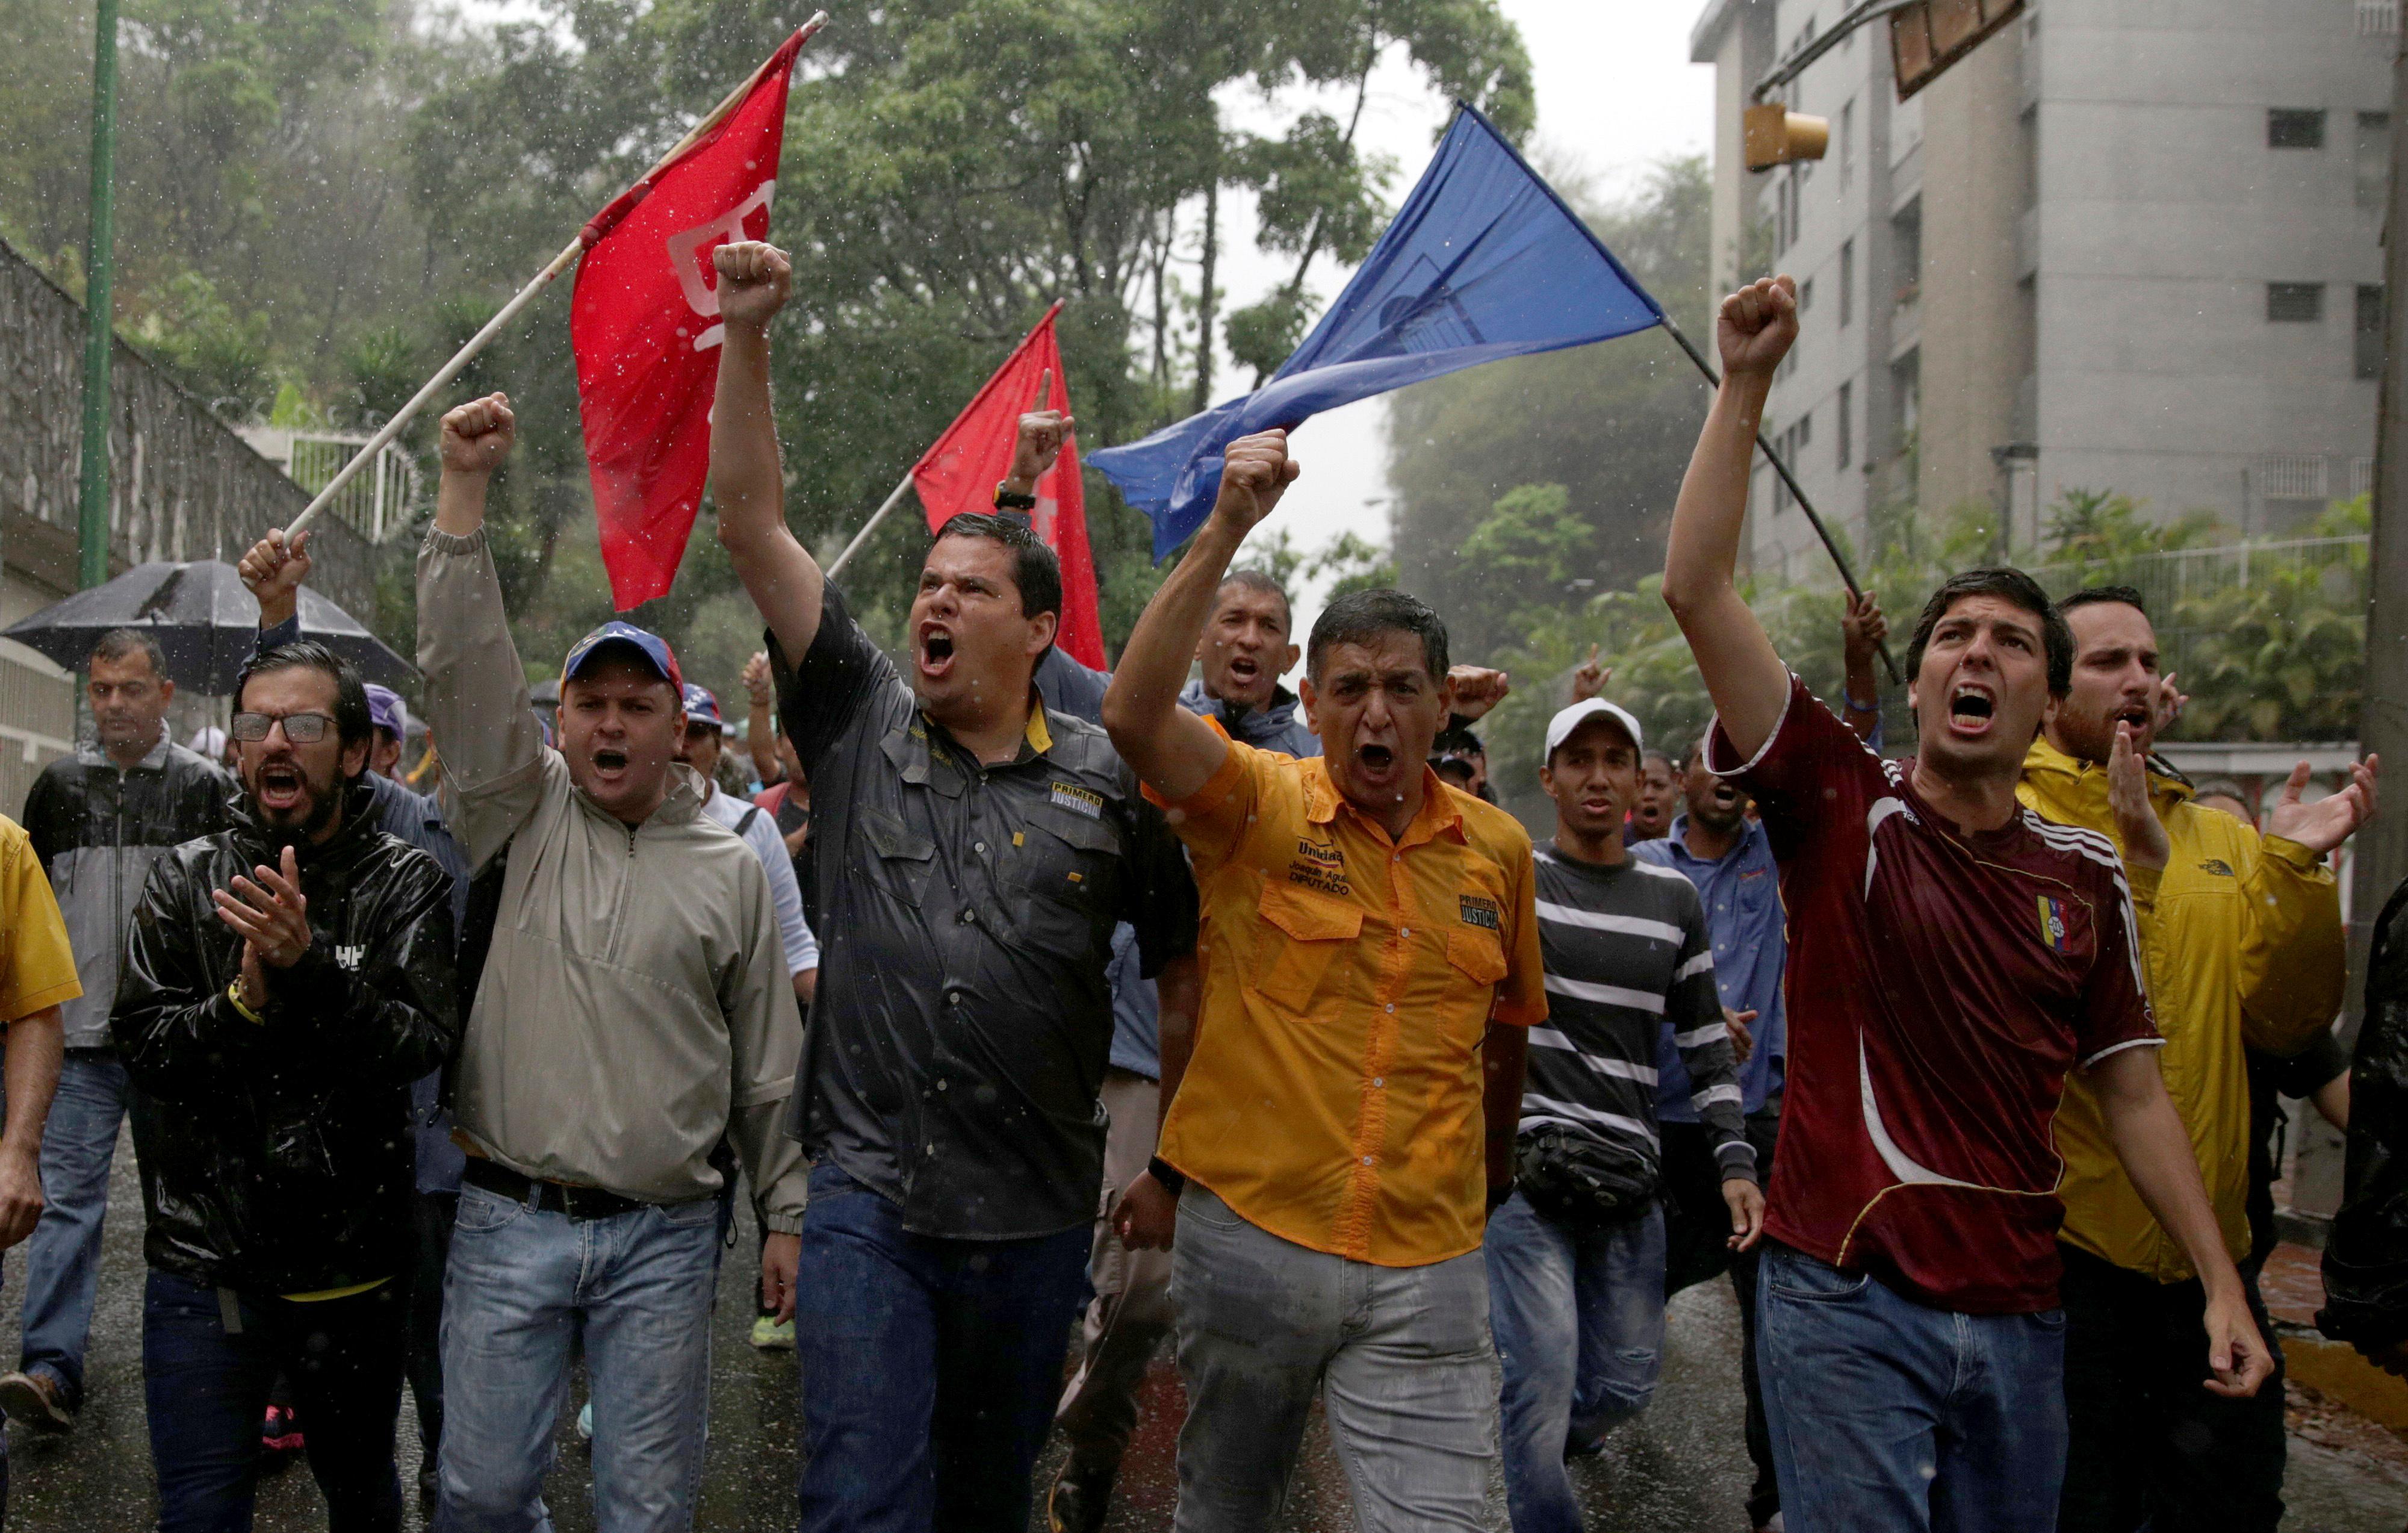 Demonstrators rally against Venezuela's President Nicolas Maduro in Caracas, Venezuela, April 13, 2017.